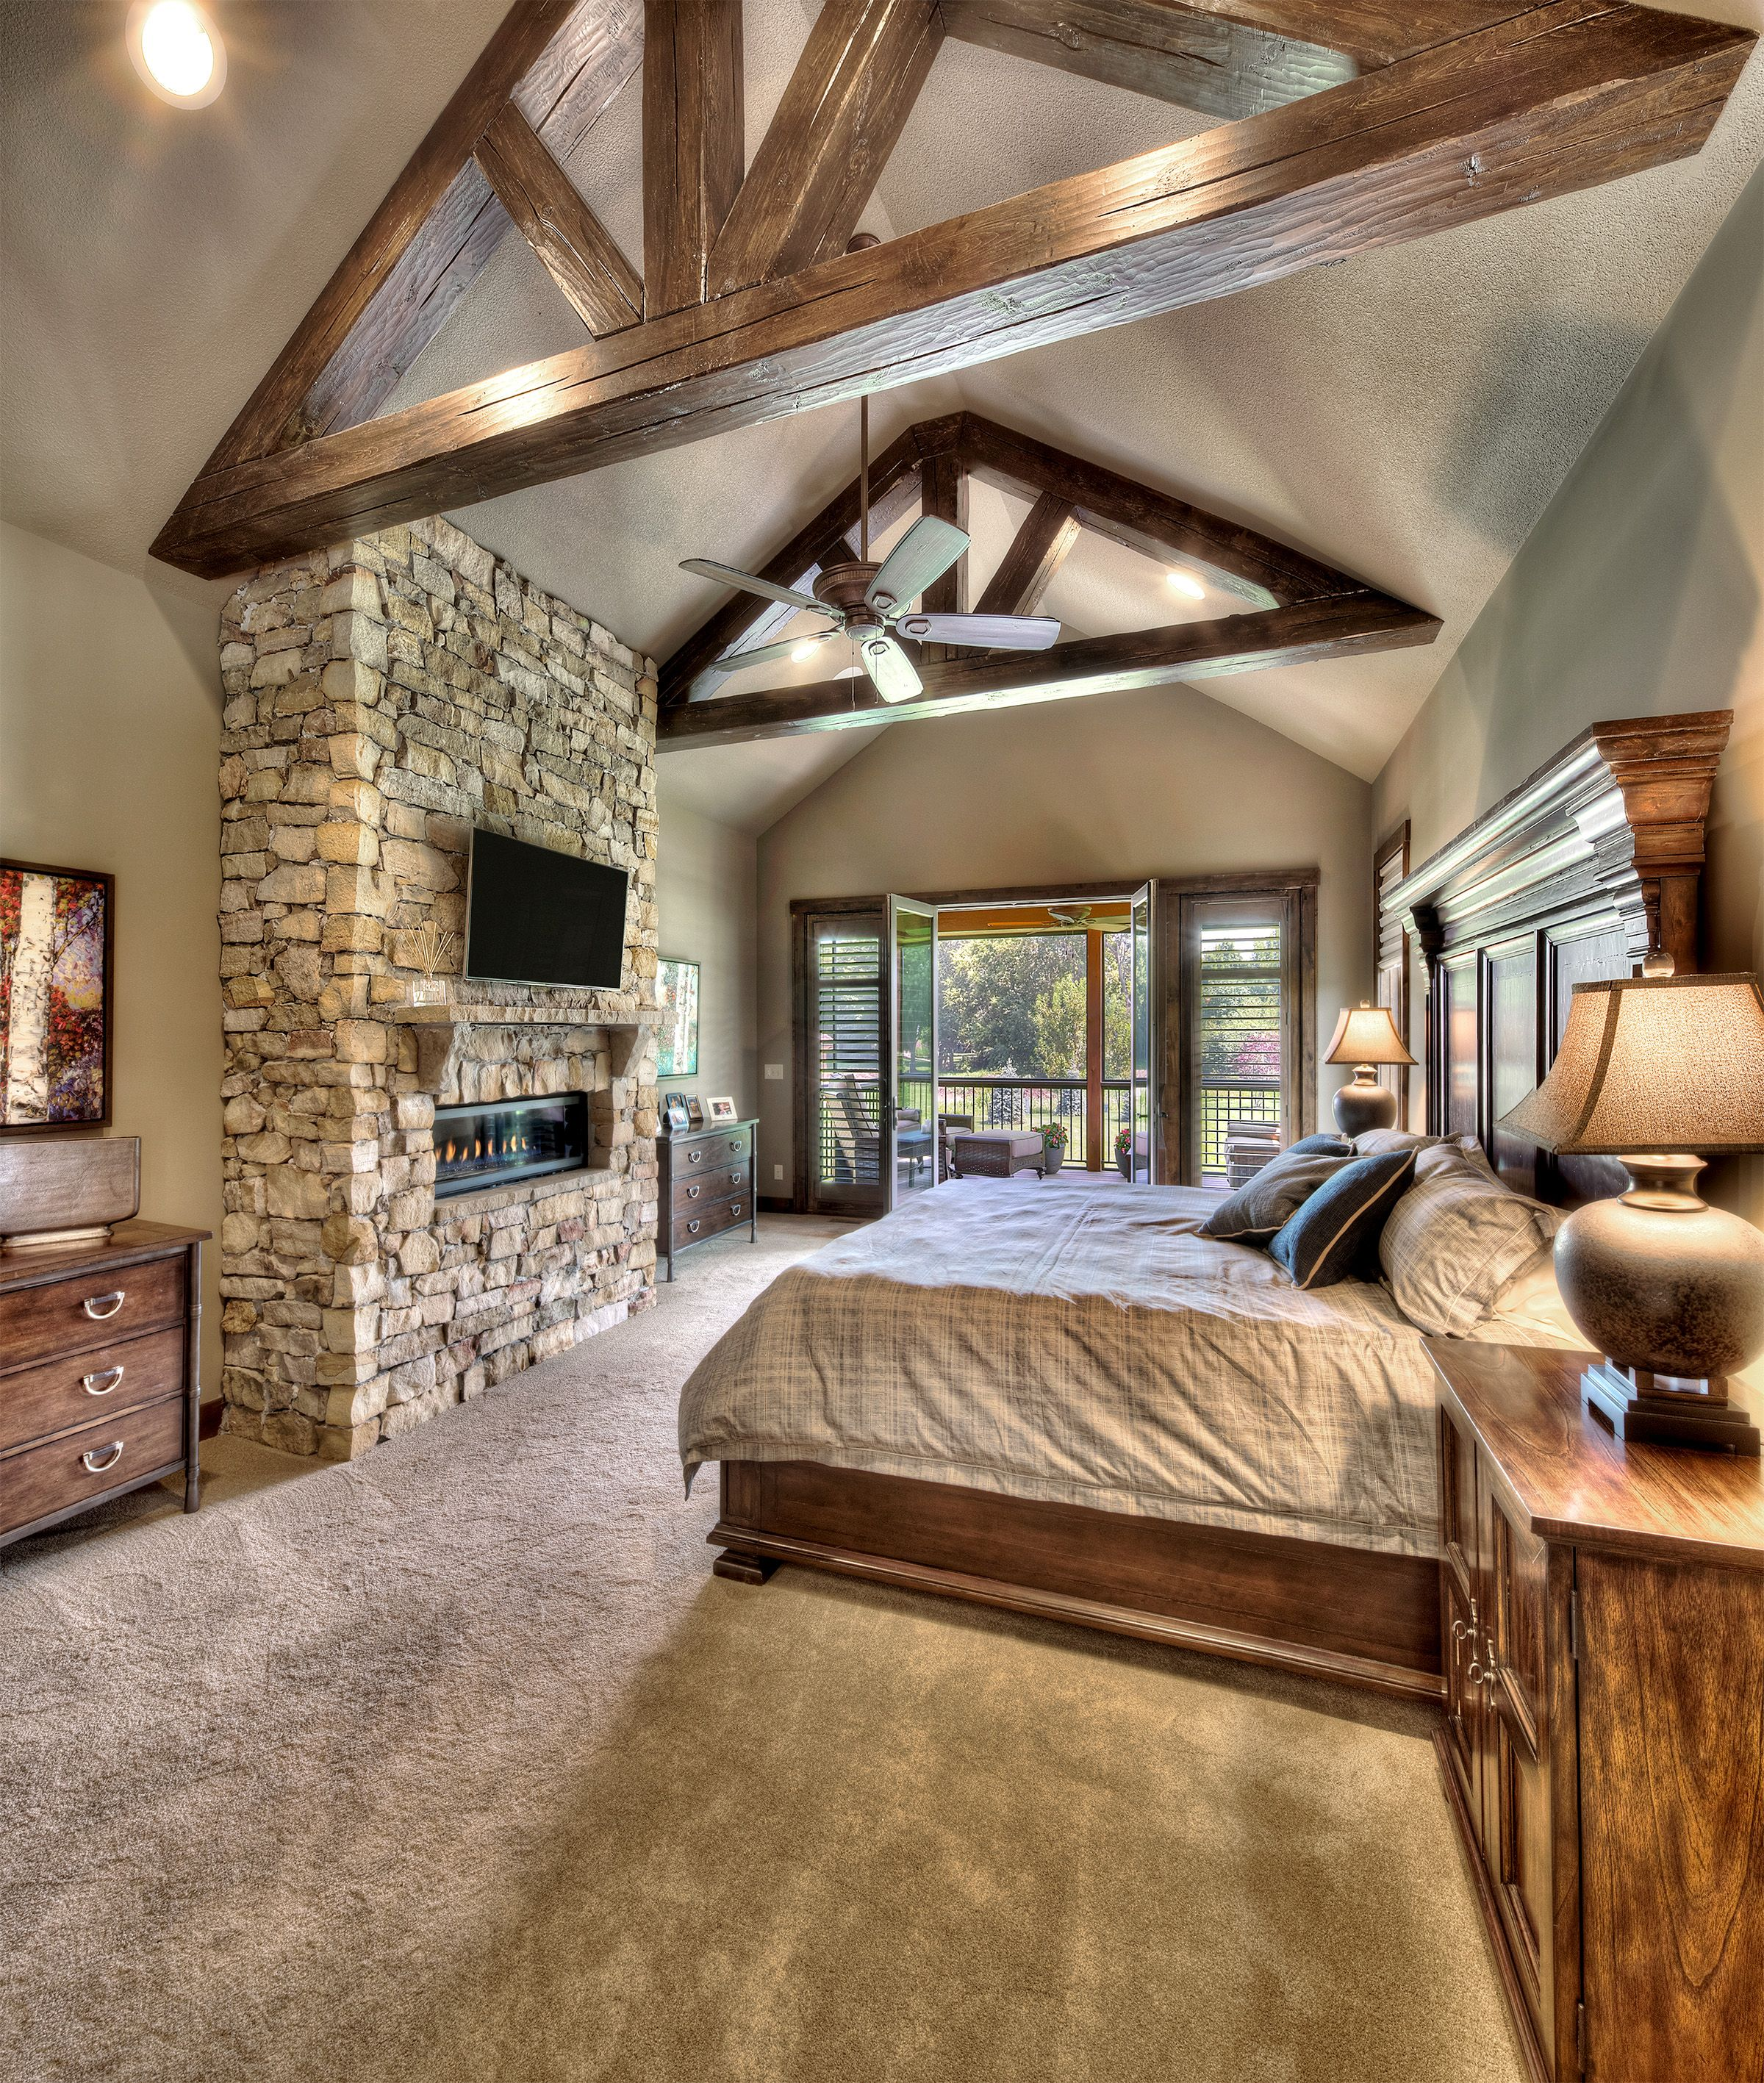 Best Master Bedroom Carpeted Wooden Beams Floor To Ceiling 640 x 480